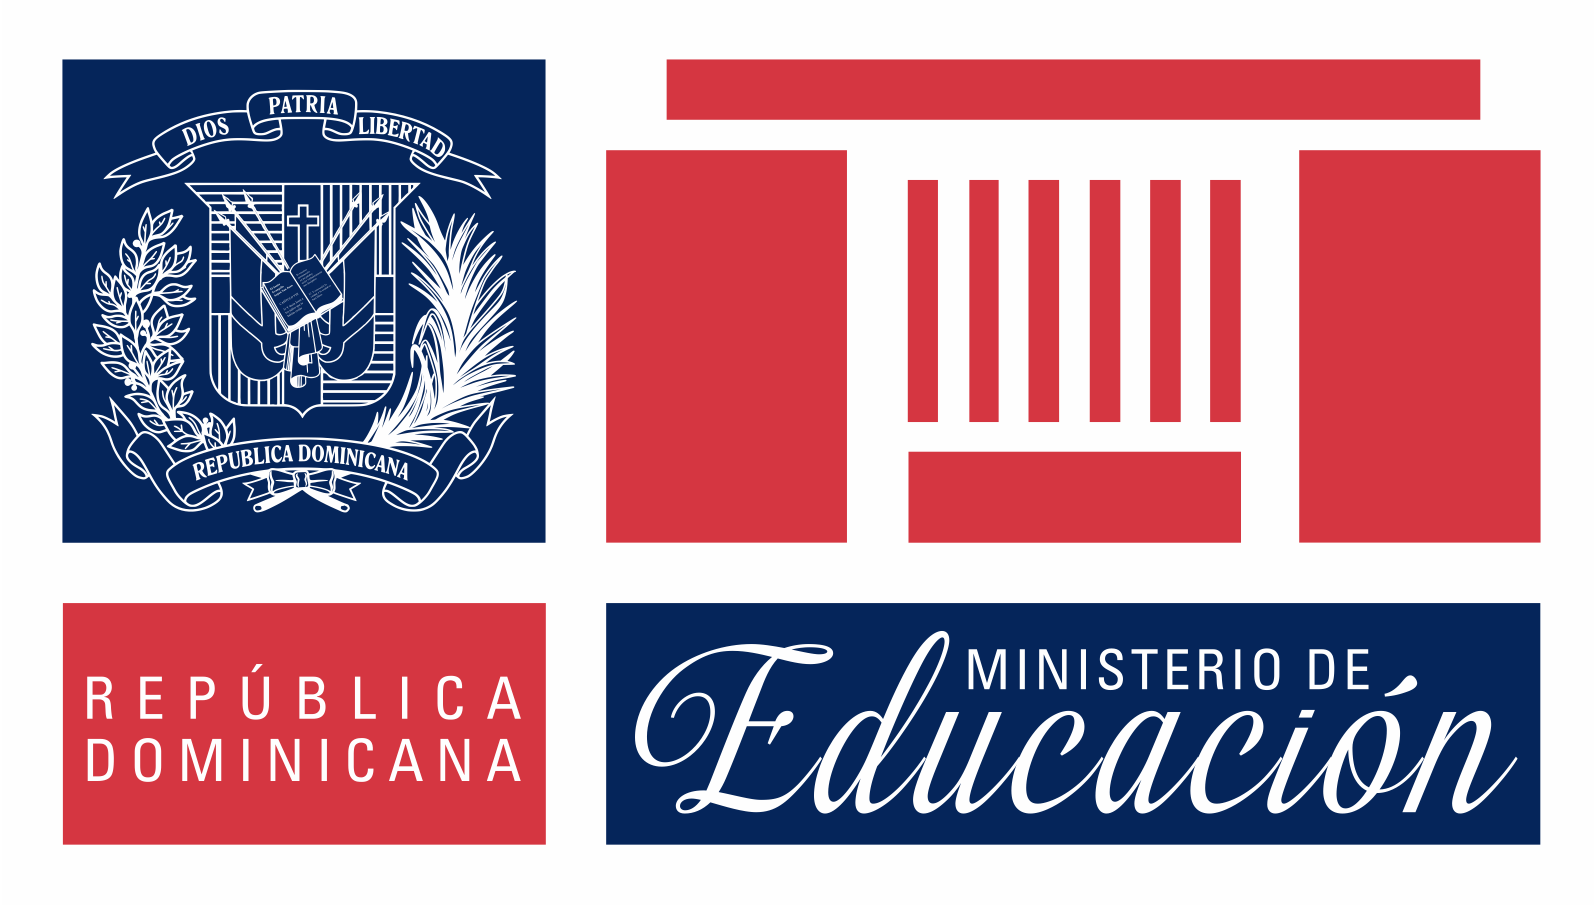 MINISTERIO DE EDUCACIÓN ESTABLECE COMISIÓN PARA APOYAR INVESTIGACIÓN EN CASO DE DENUNCIA DE AGRESIÓN SEXUAL CONTRA ESTUDIANTE